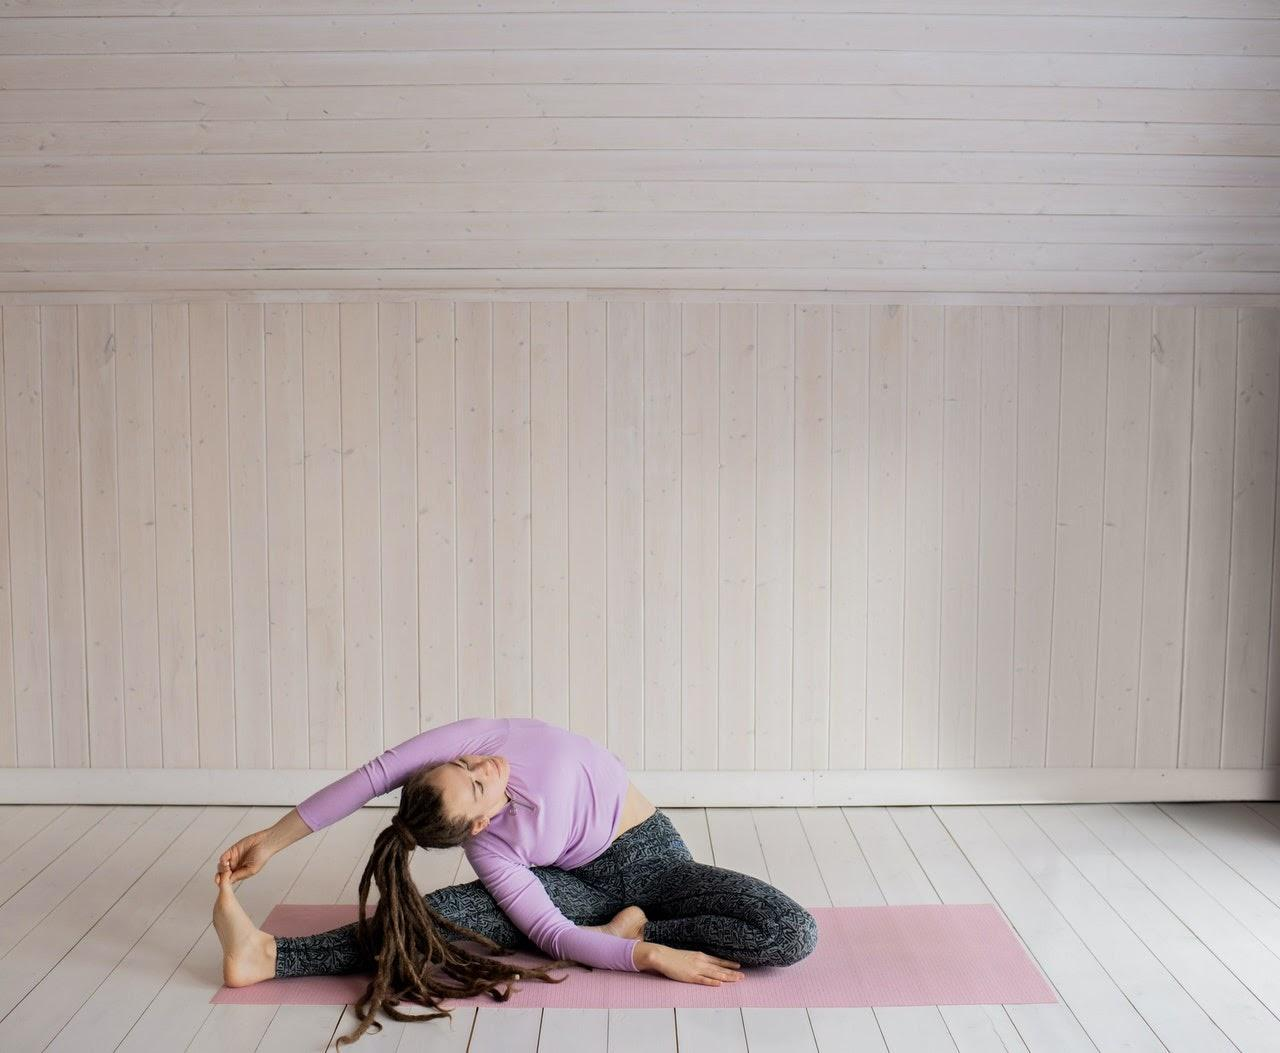 a flexible yogi stretching on a pink yoga mat